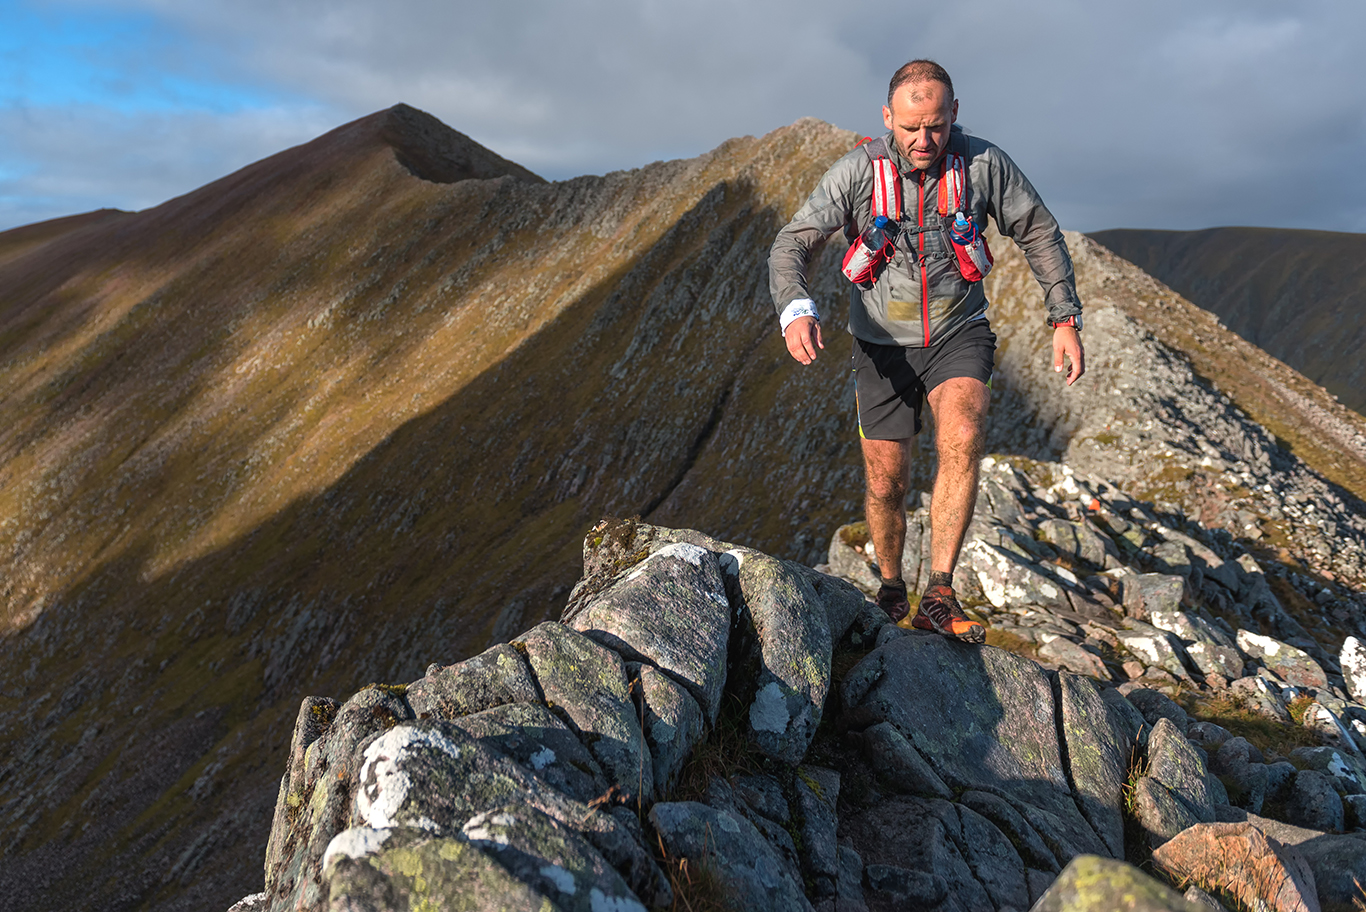 Skyrunning world champs coming to Scotland